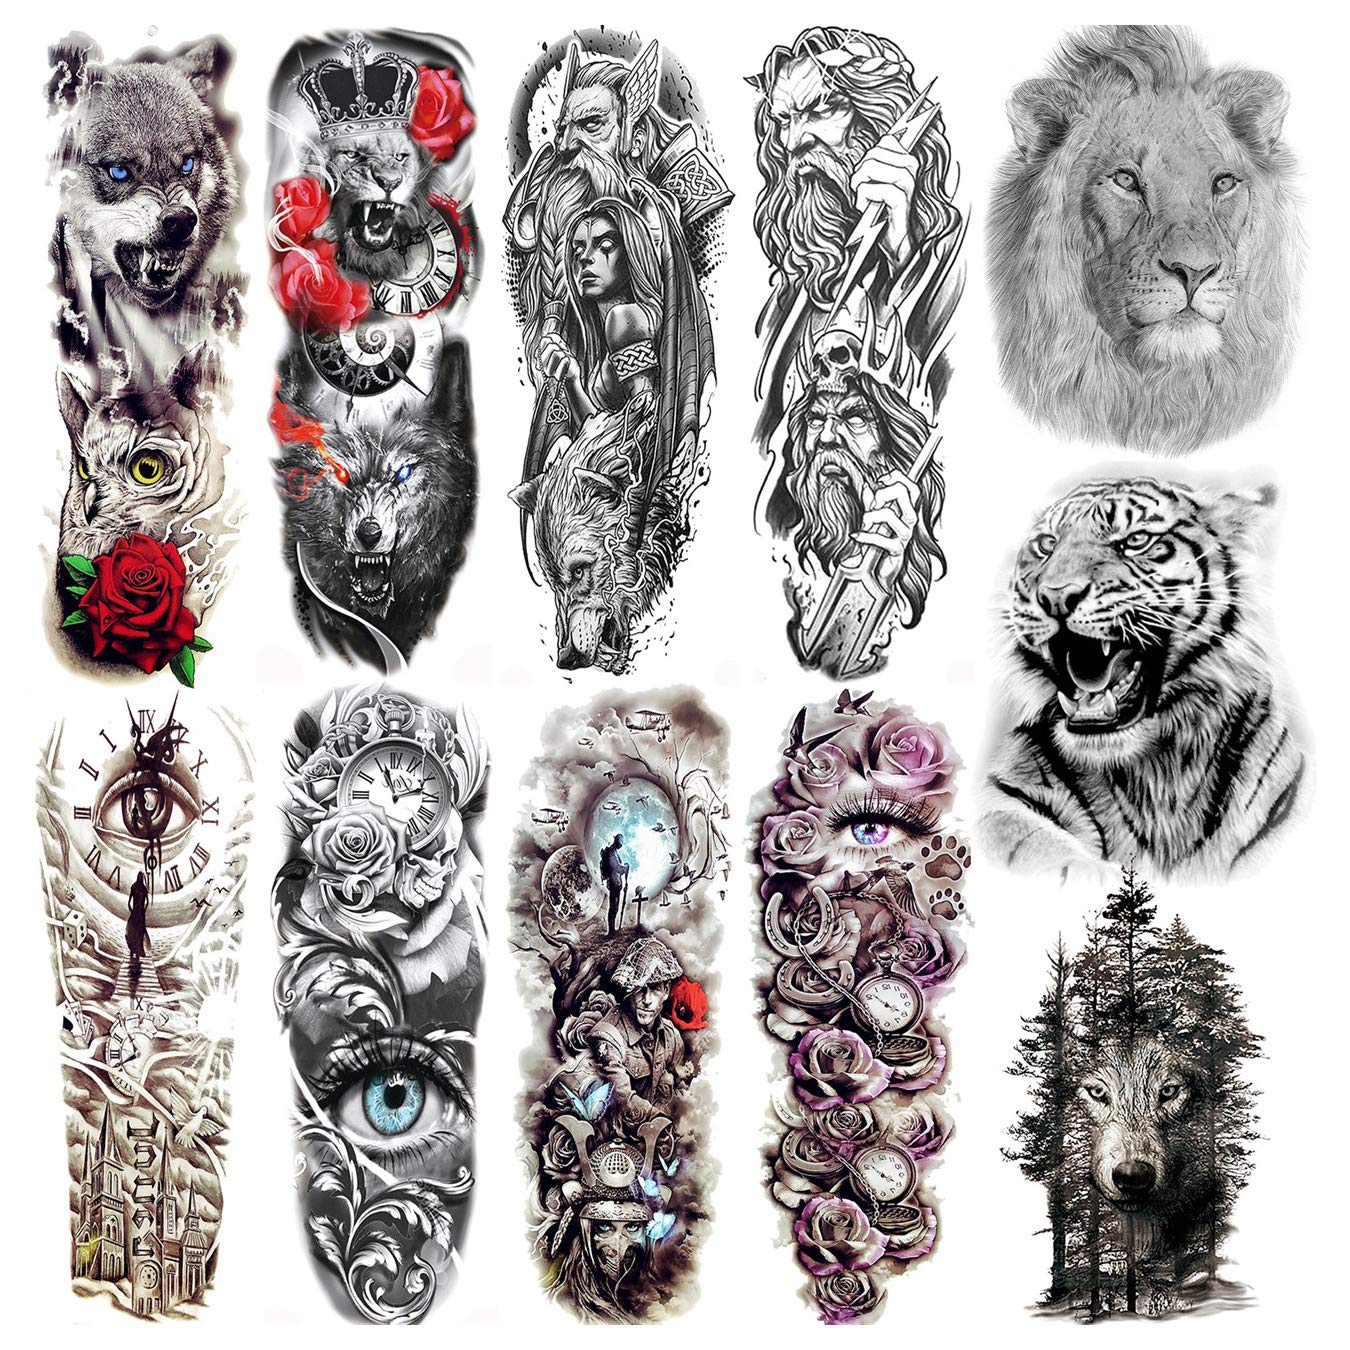 Tatuajes Temporales grandes manga para hombres mujeres brazo completo Selleve Tatoos temporal realista falso Lobo tigre león militar para adultos